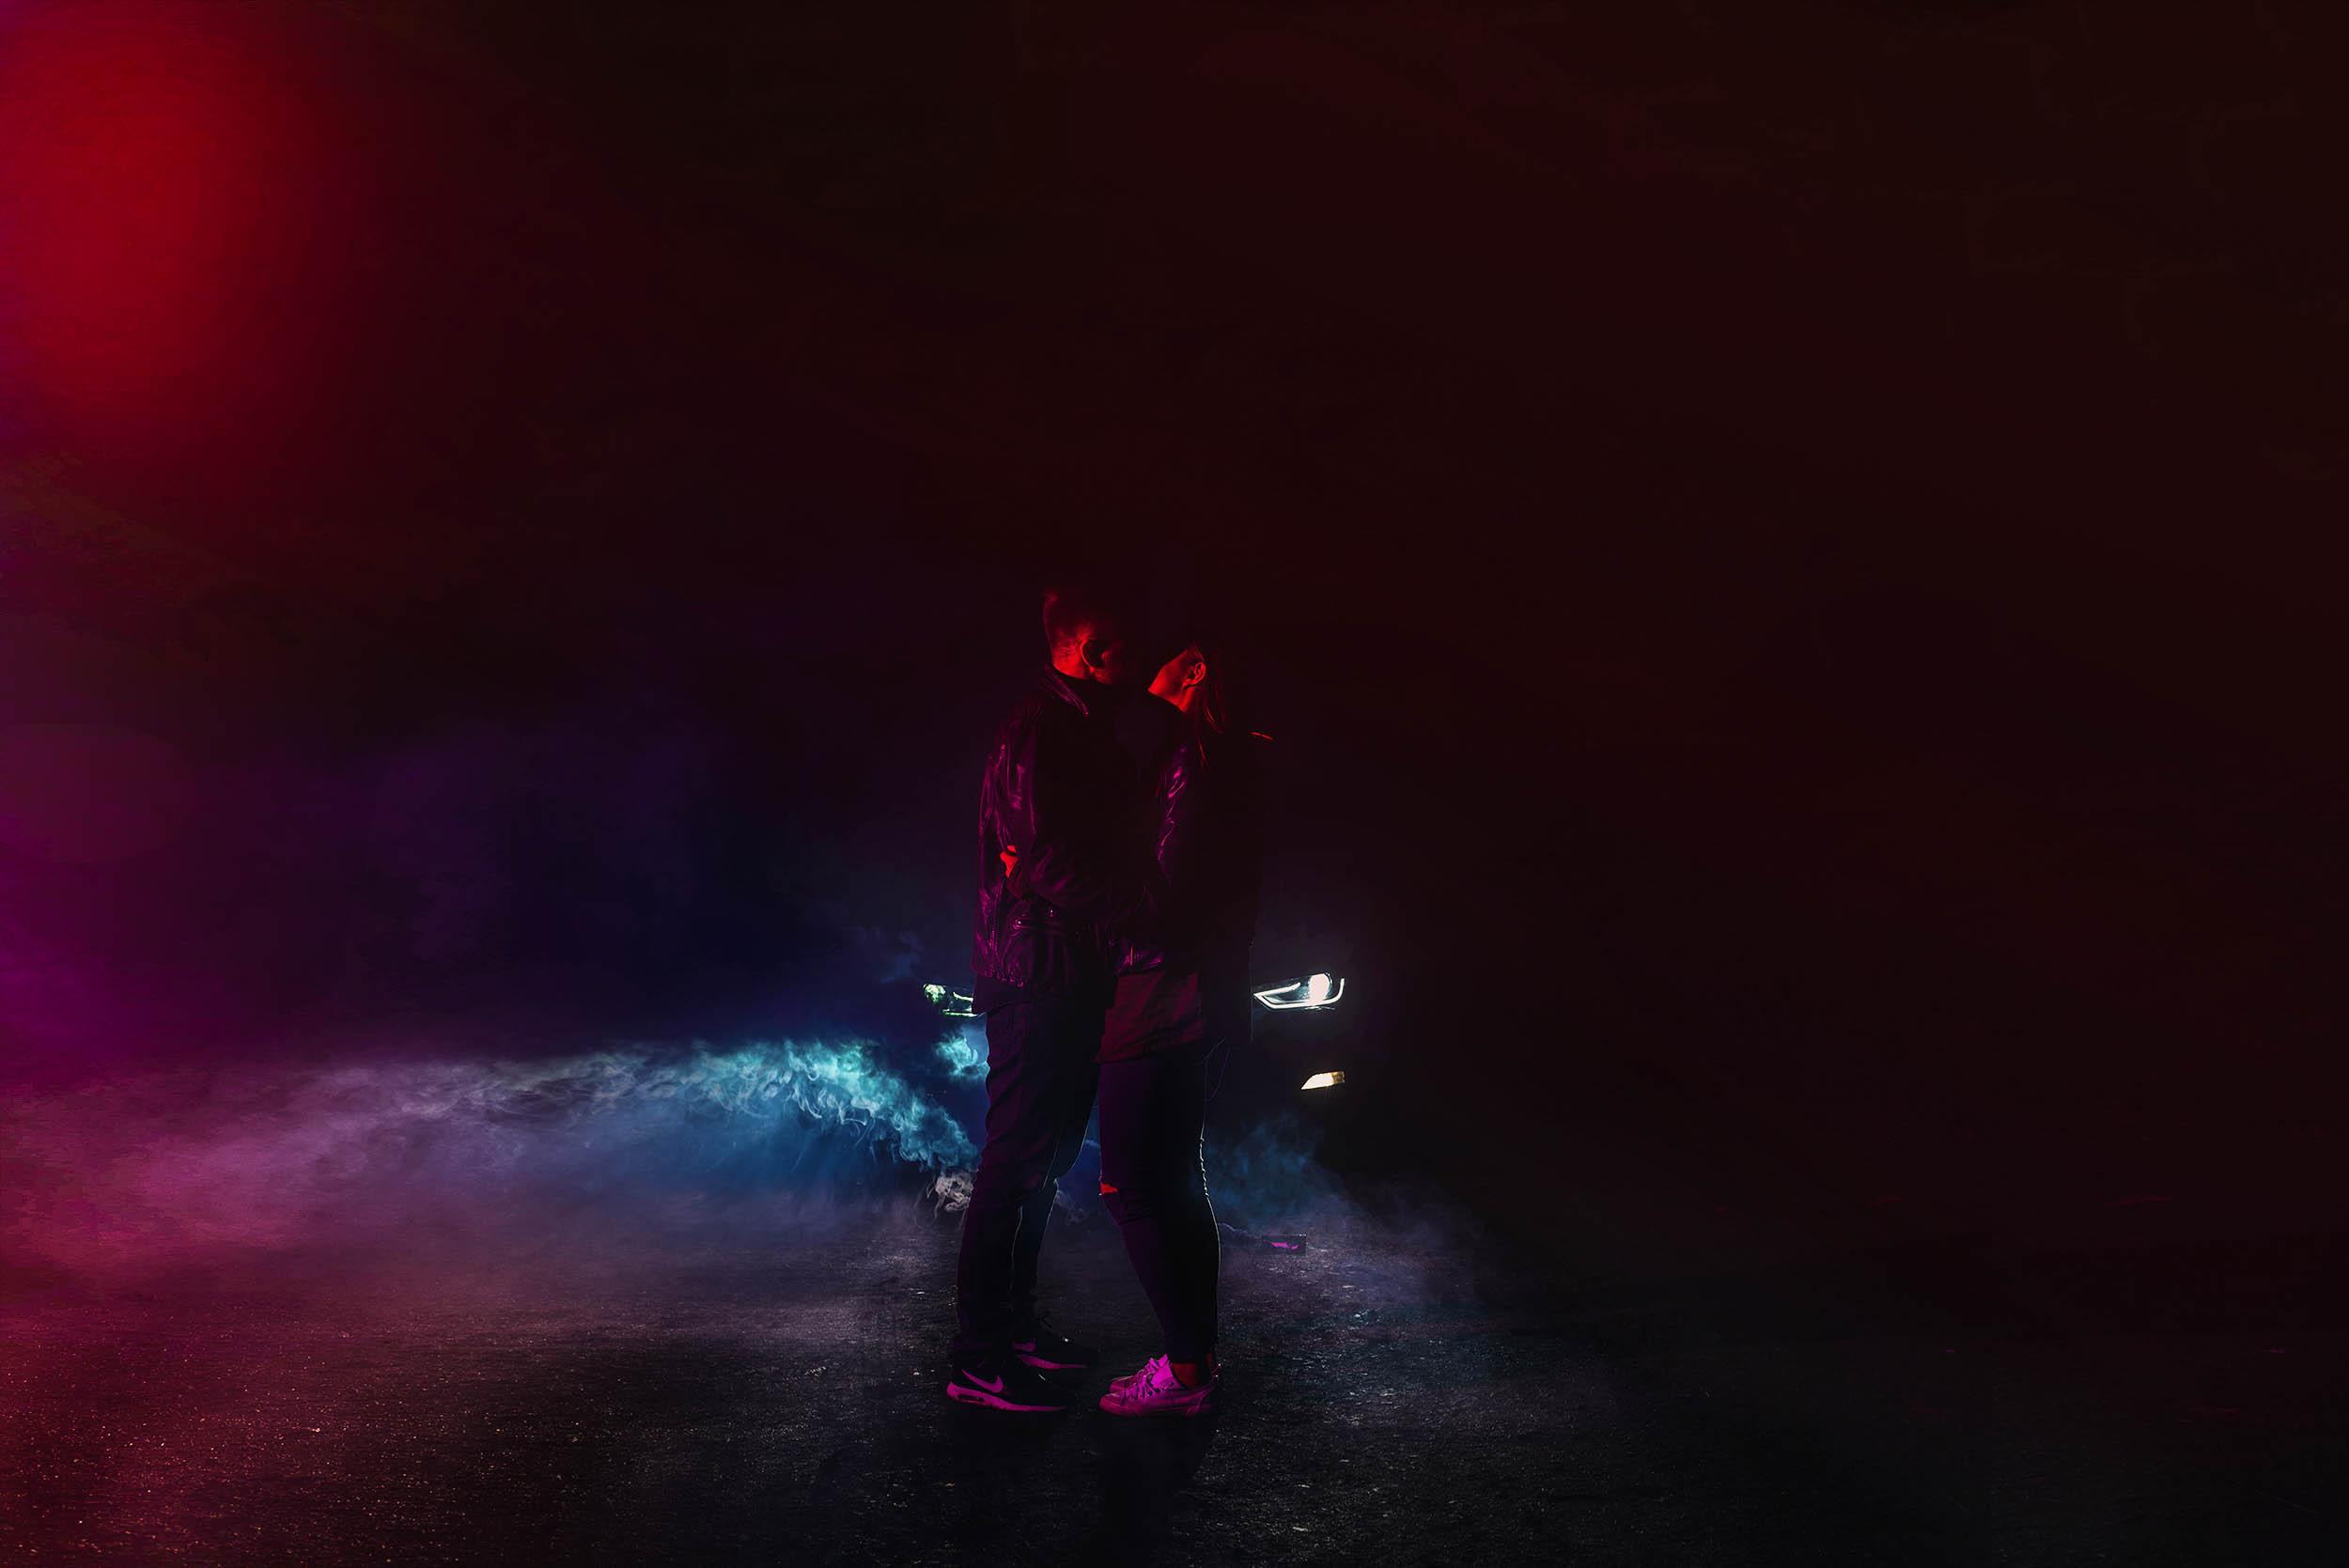 Kiss in the smoke